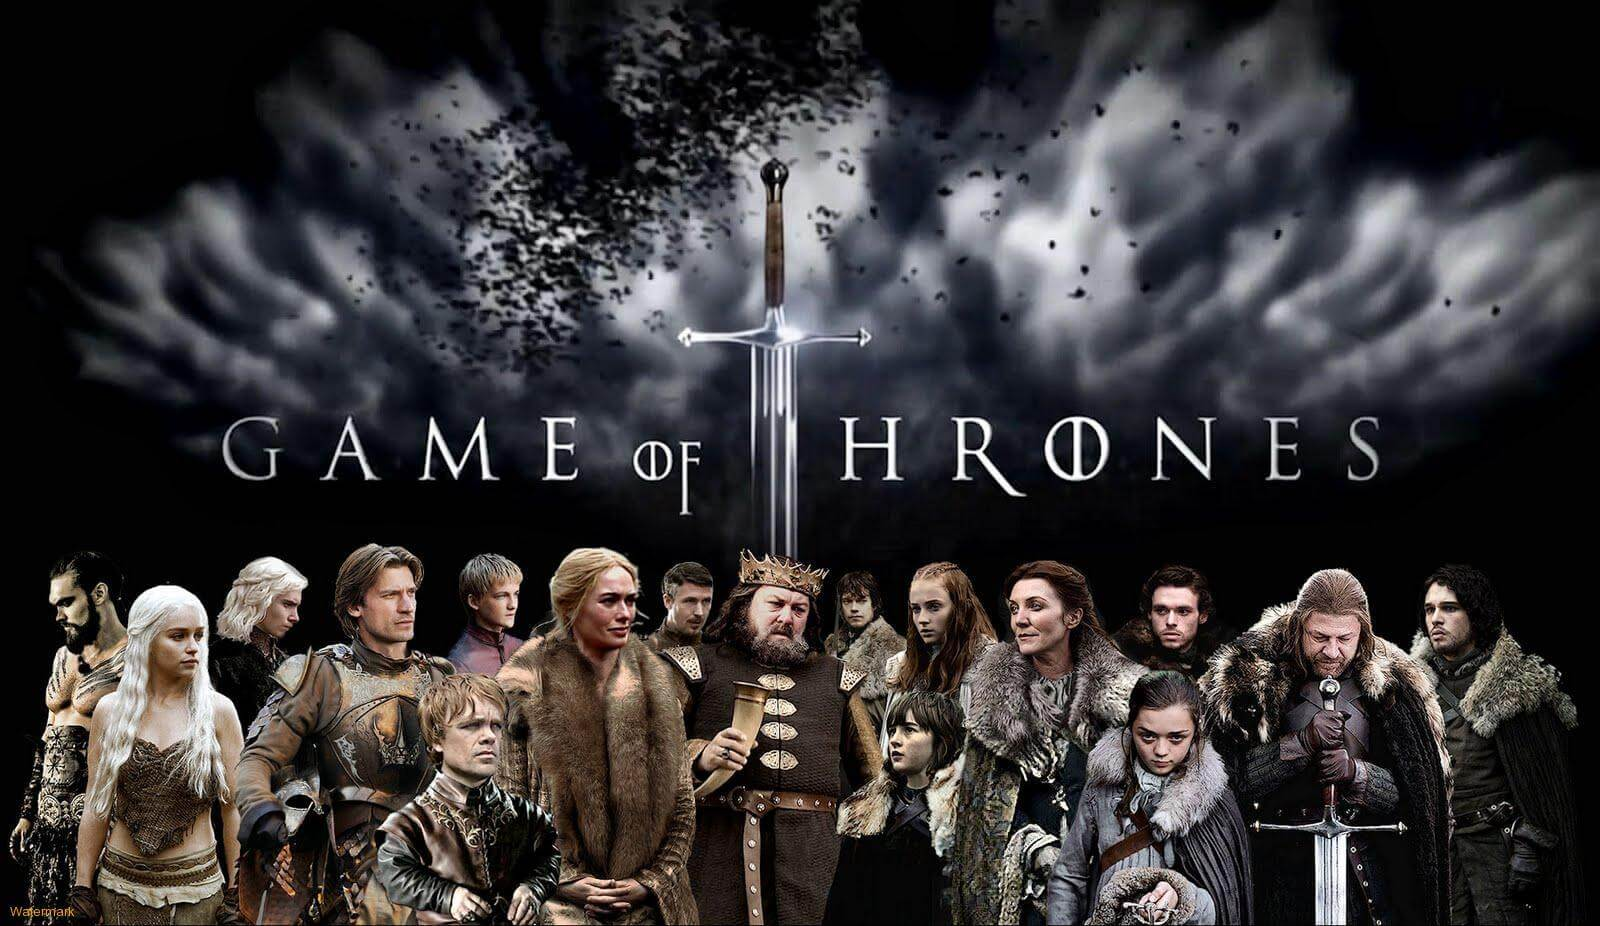 Game of Thrones Dothraki Phrasebook 4